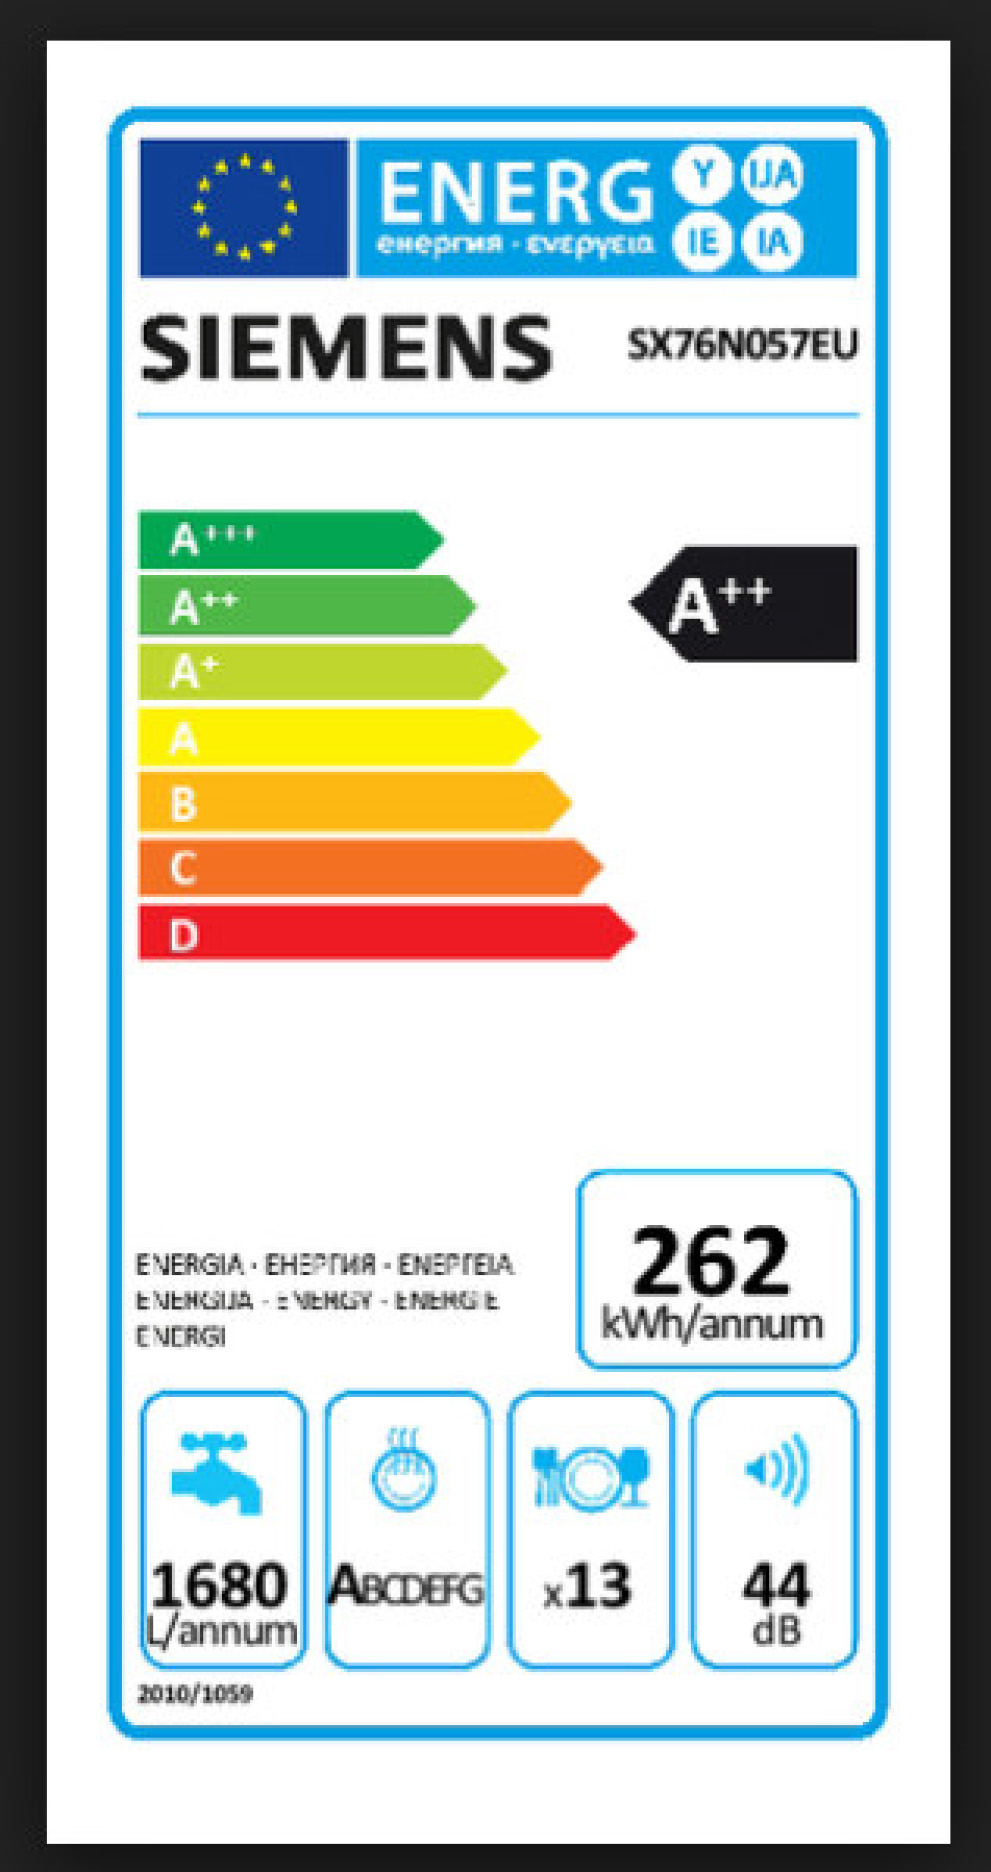 Siemens Energielabel sx76n057eu